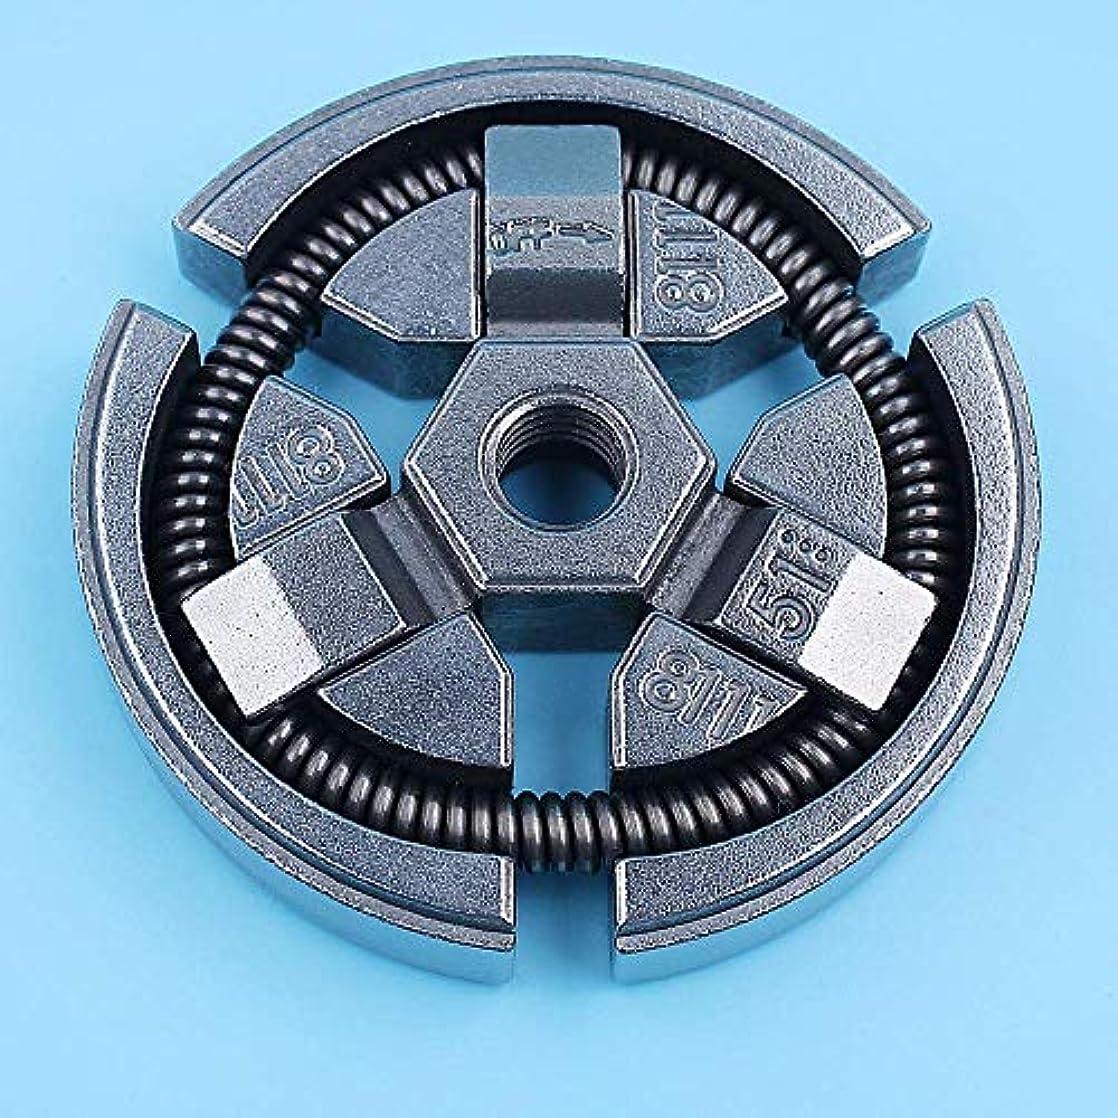 AiCheaXツール-ハスクバーナ261 EPA 262 262XPチェーンソー用クラッチアセンブリ503577101、503657801交換部品